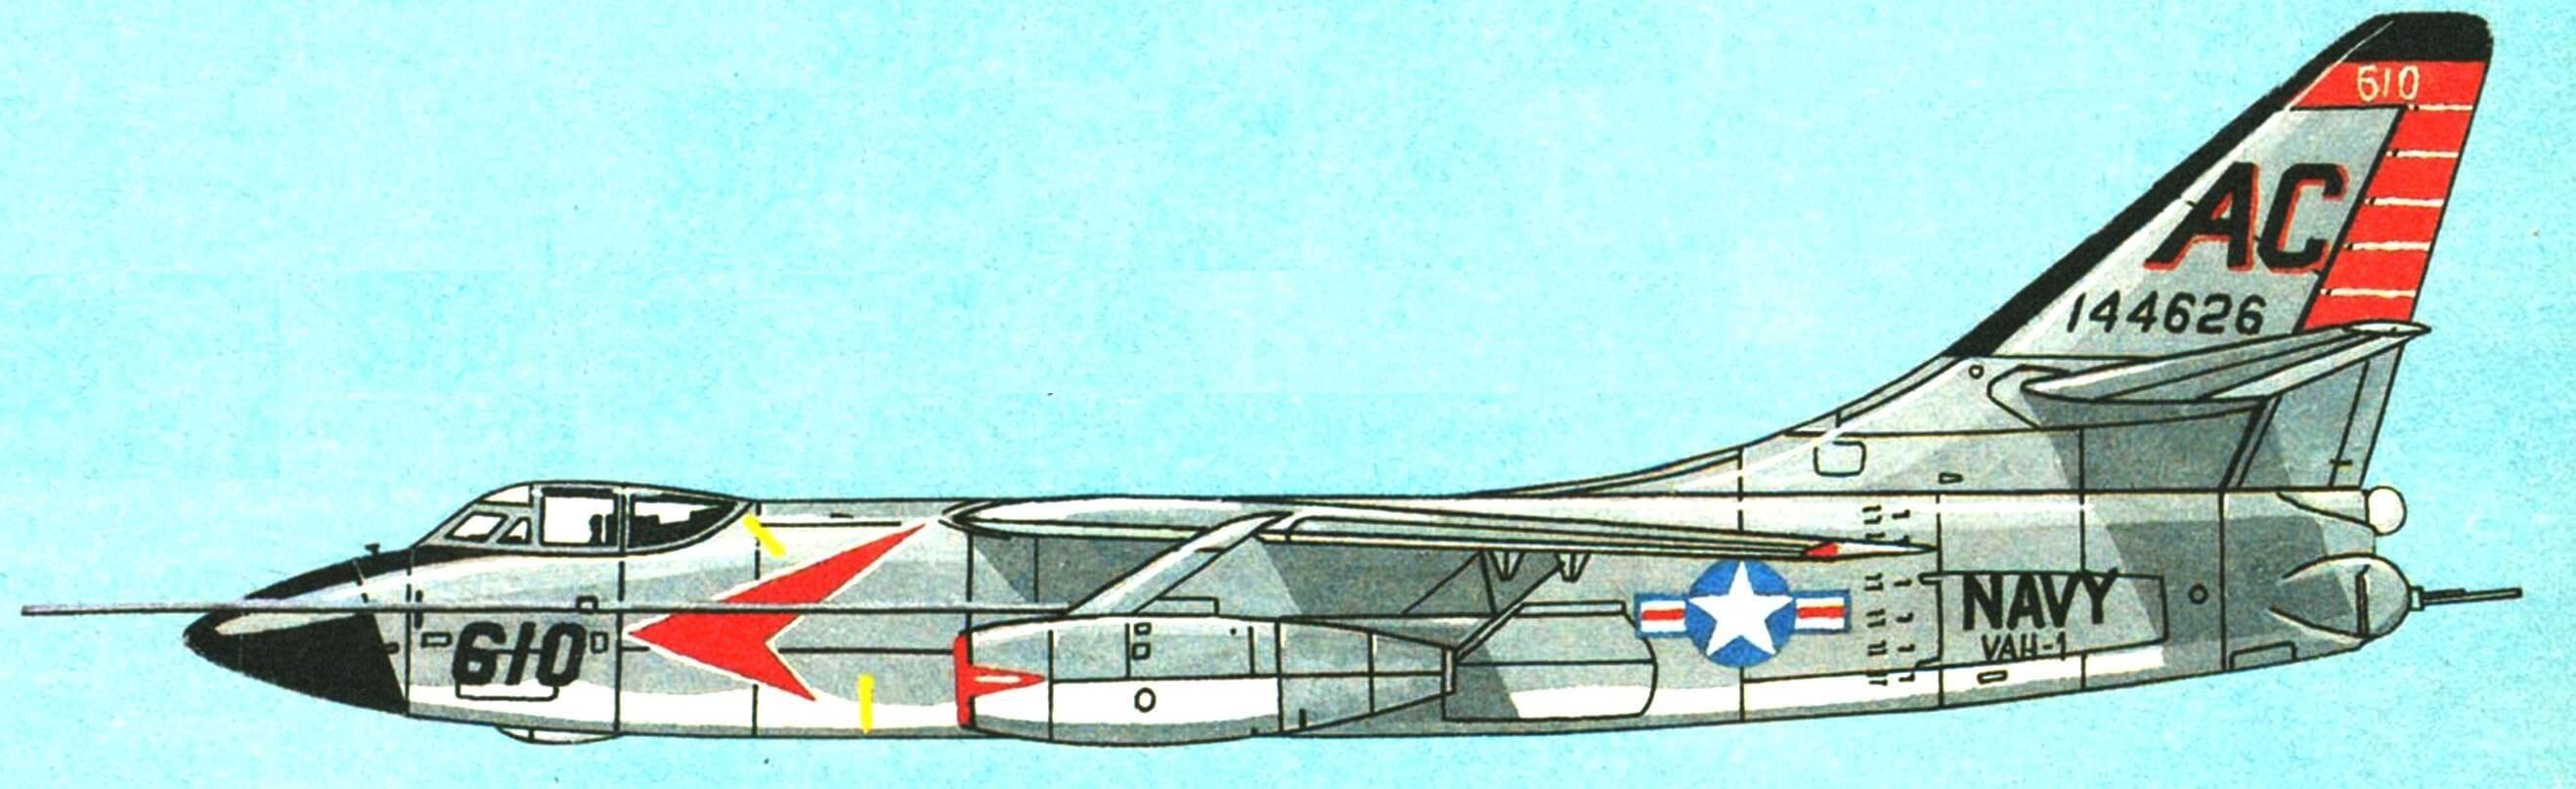 Самолет А-3А эскадрильи VAH-1 «Tigers» авианосец «Independence», 1961 г.